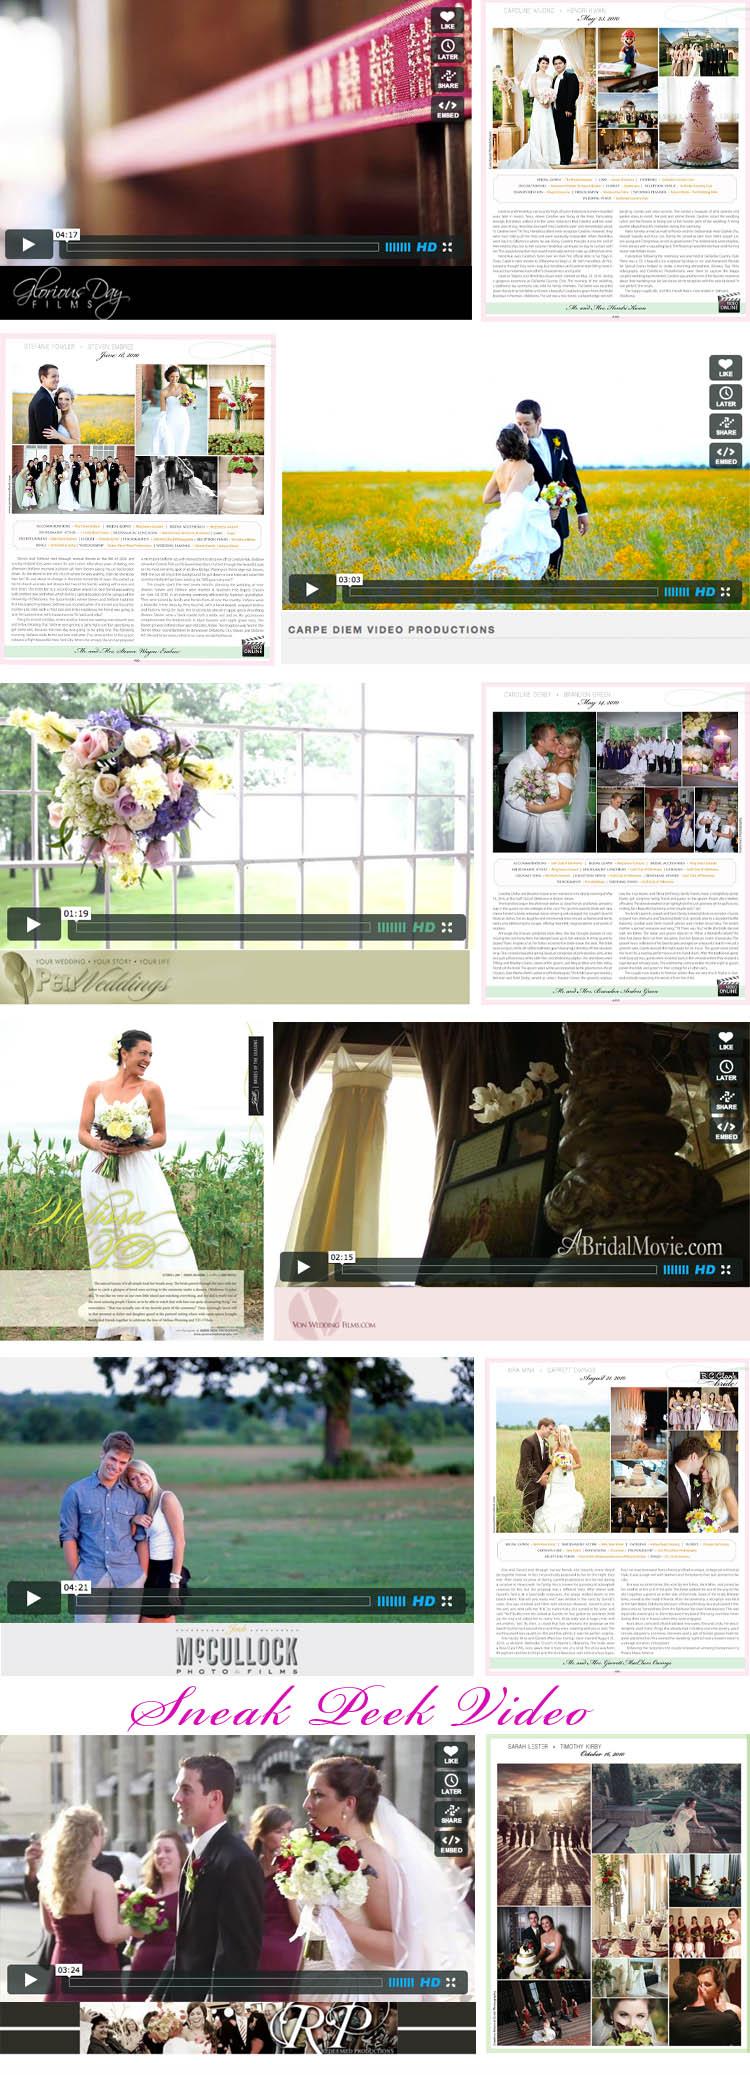 the world of wedding cinematography